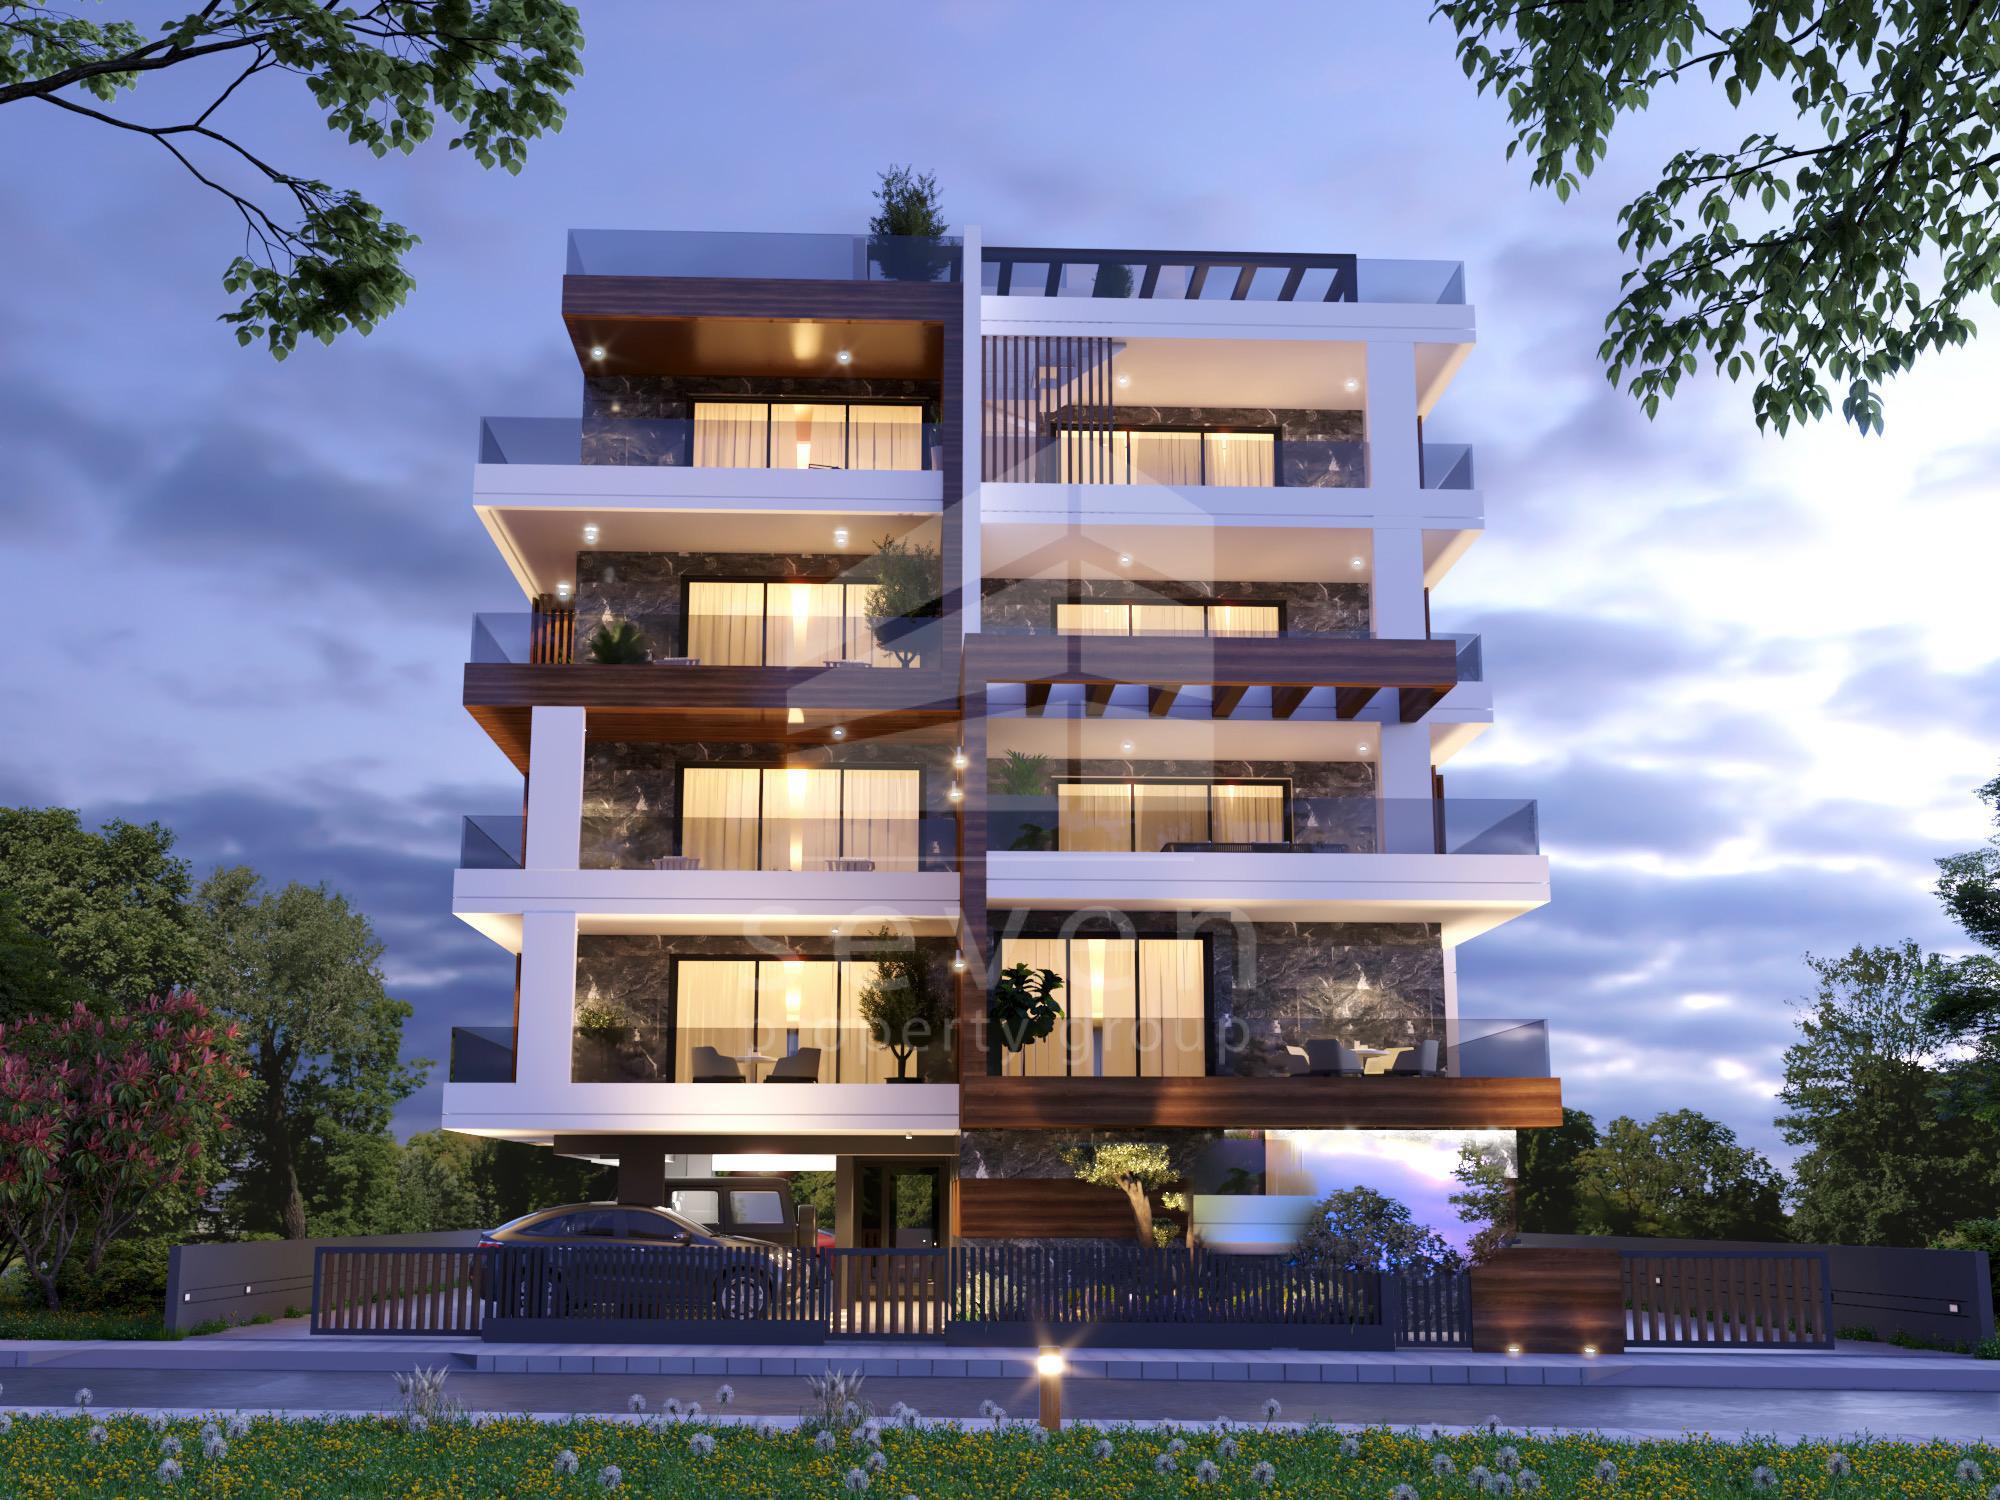 Off-Plan Two Bed Apartment In Stratigou Timayia Area